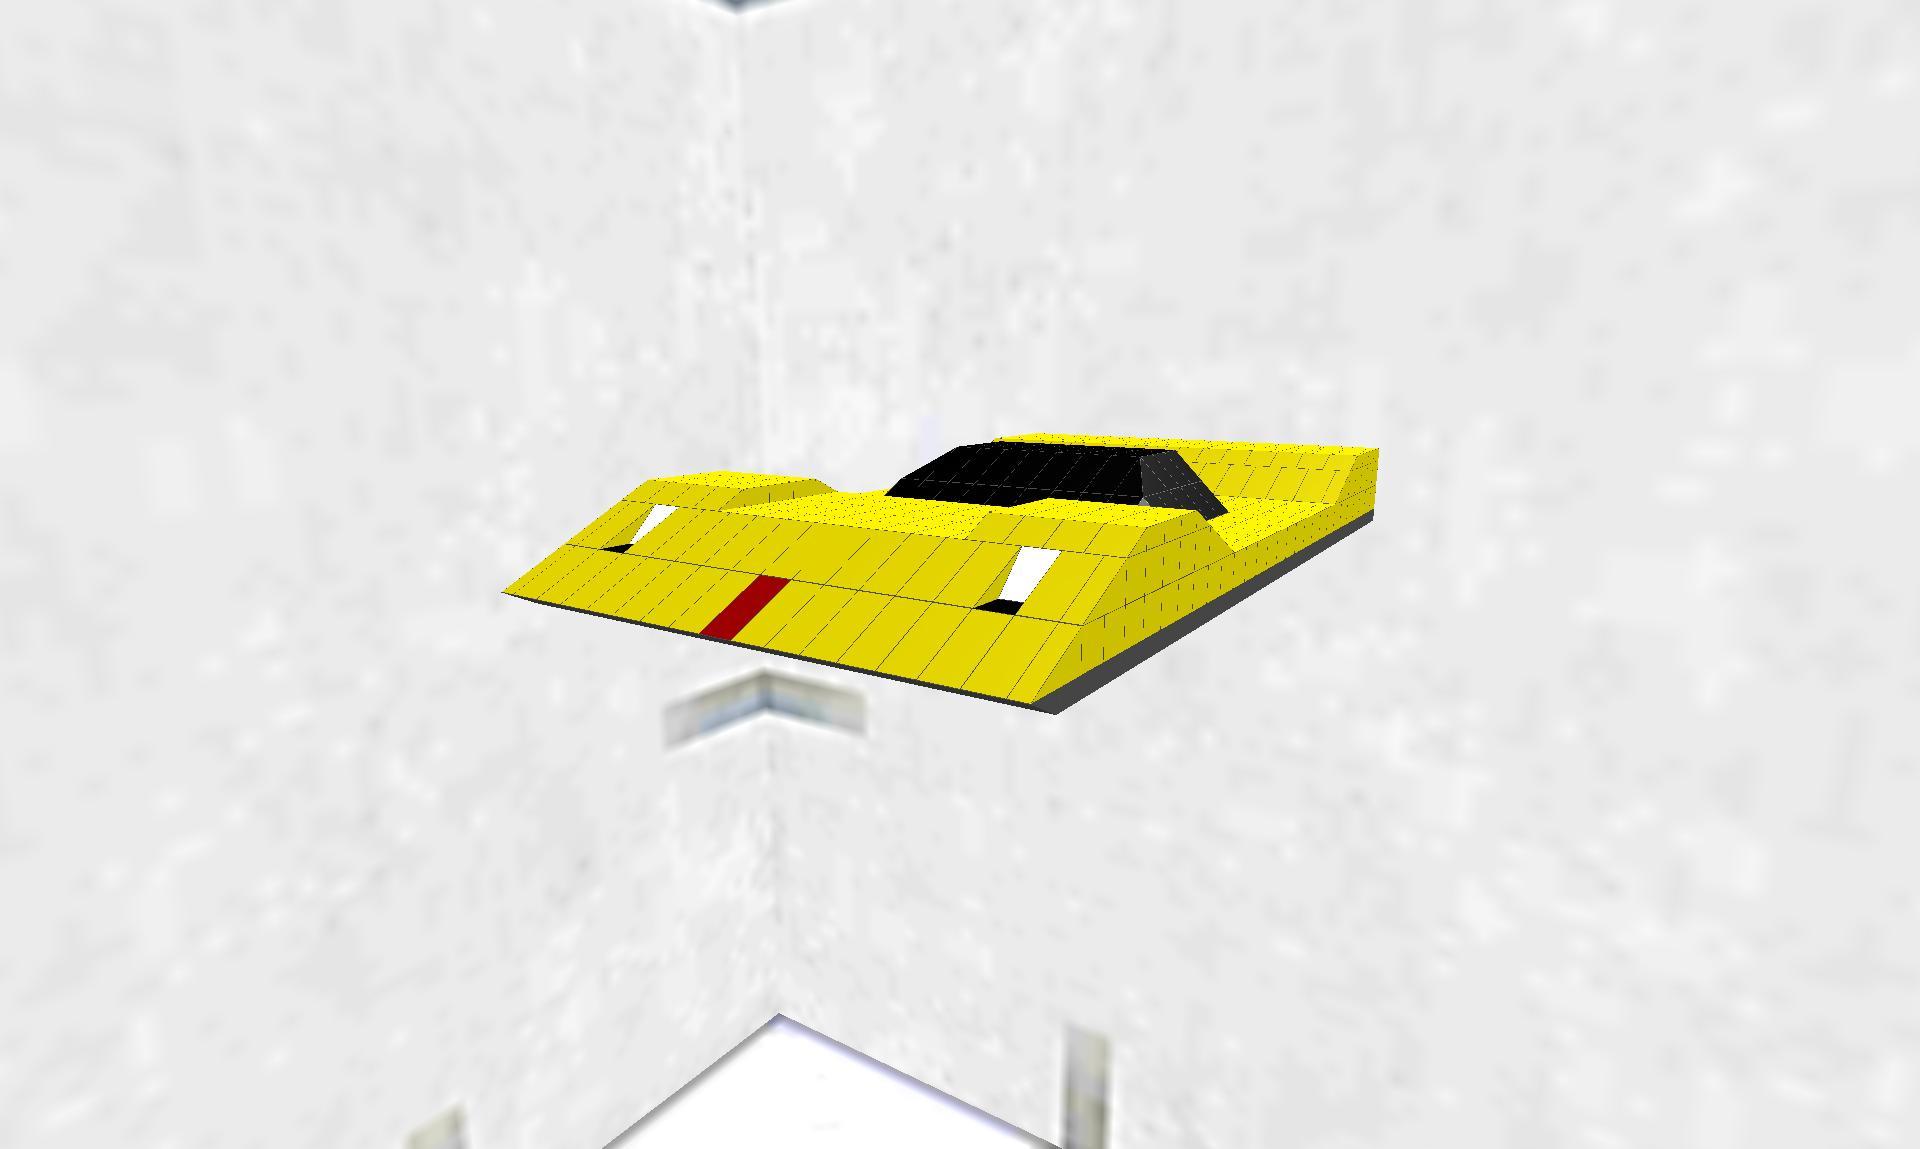 TOMAHAWK F-ZERO2 172kmOVER